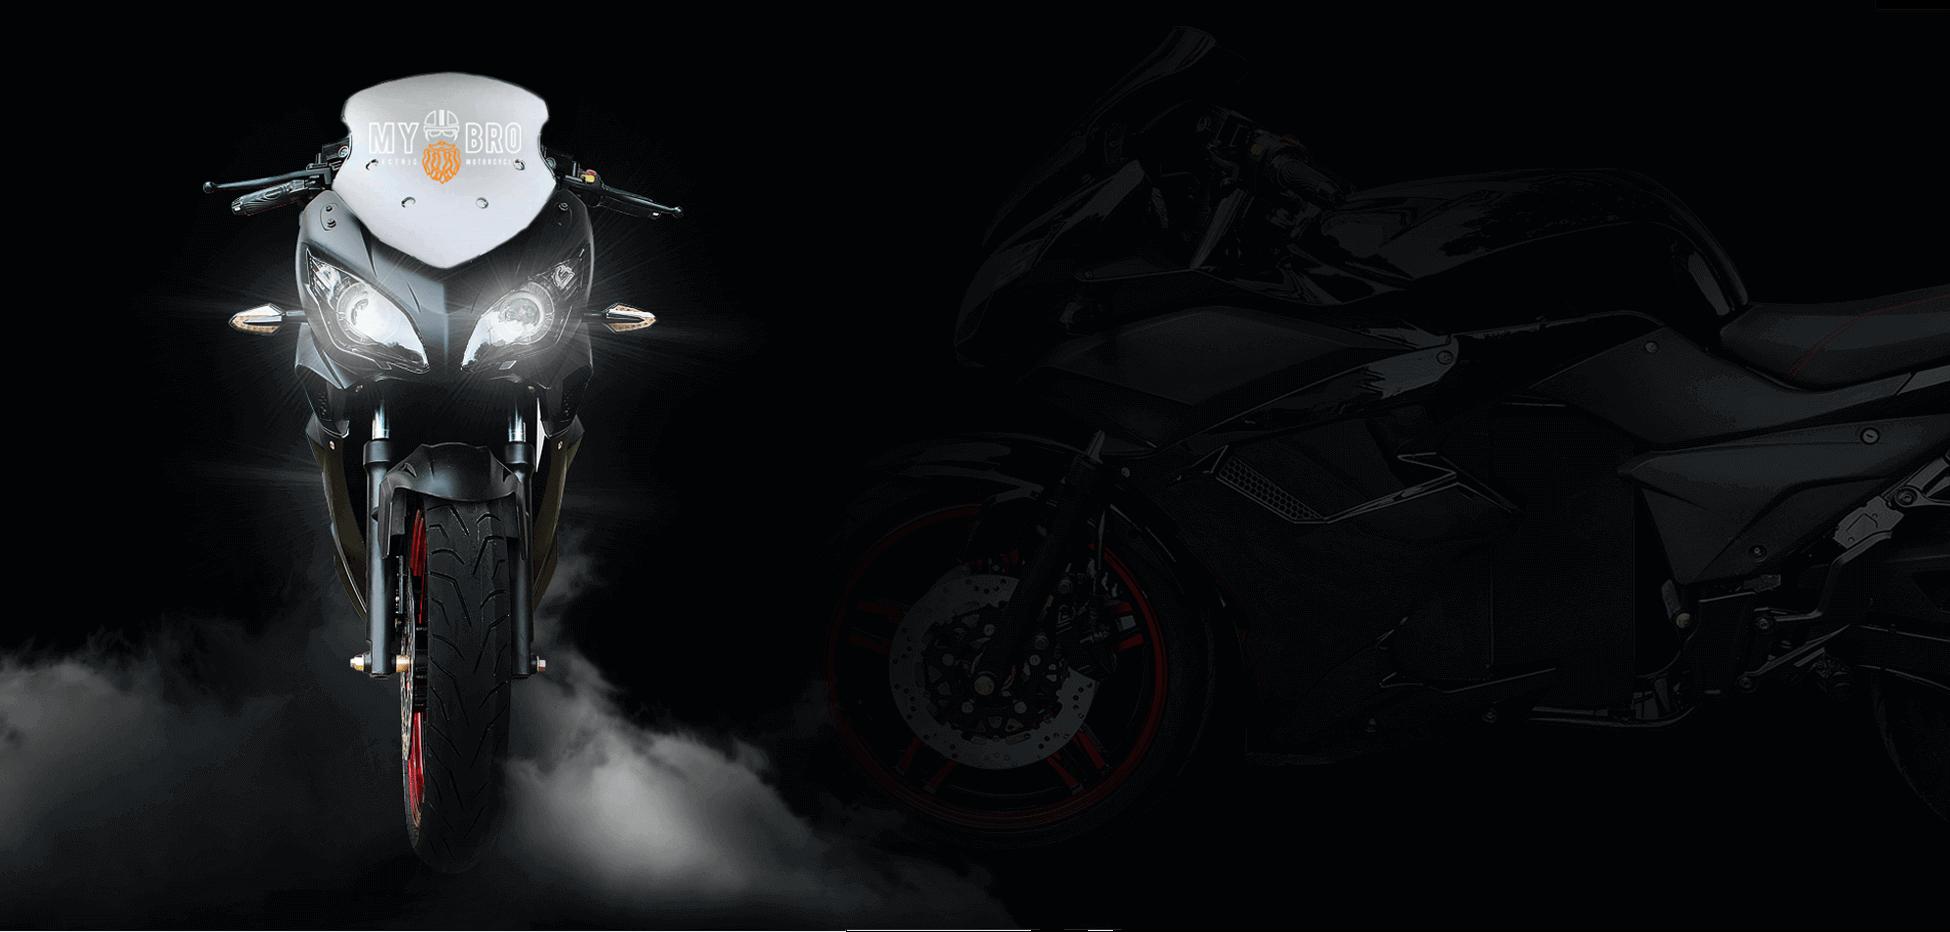 MYBRO electric motorcycles